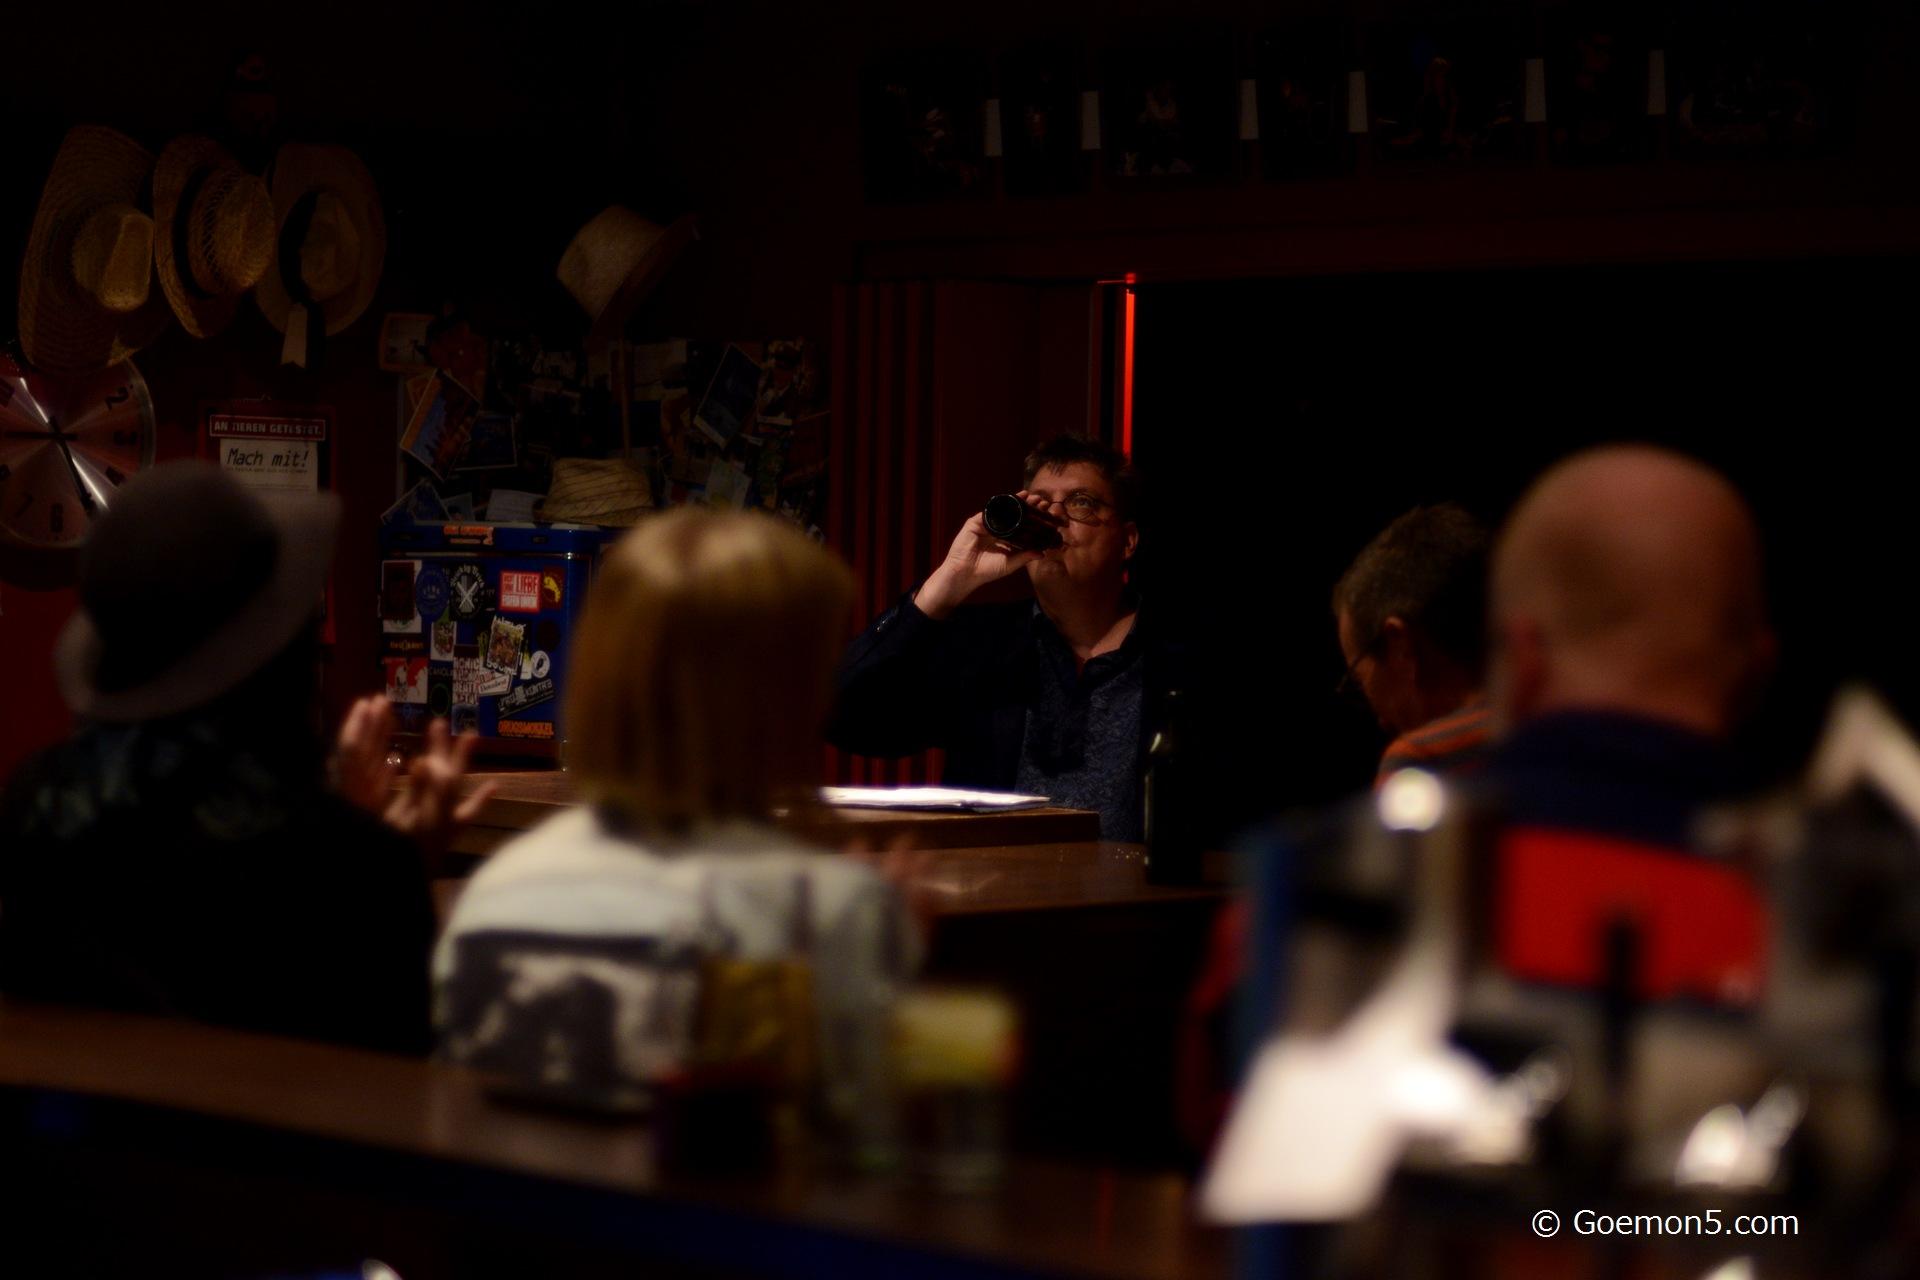 Andreas Spider Krenzke at Parkclub 8